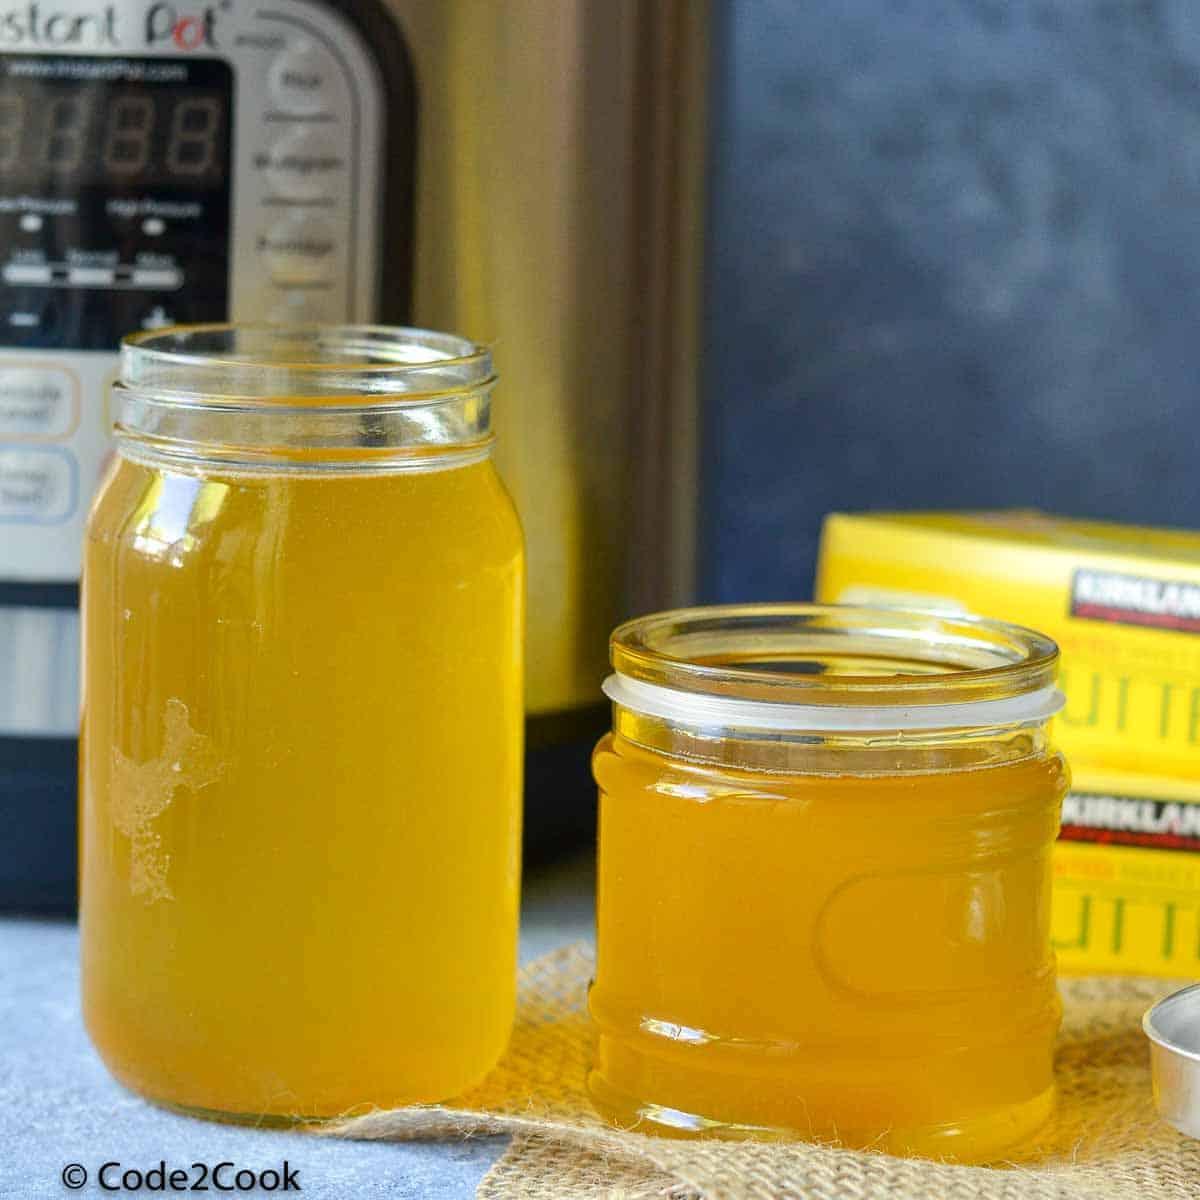 homemade ghee stored in glass jar.